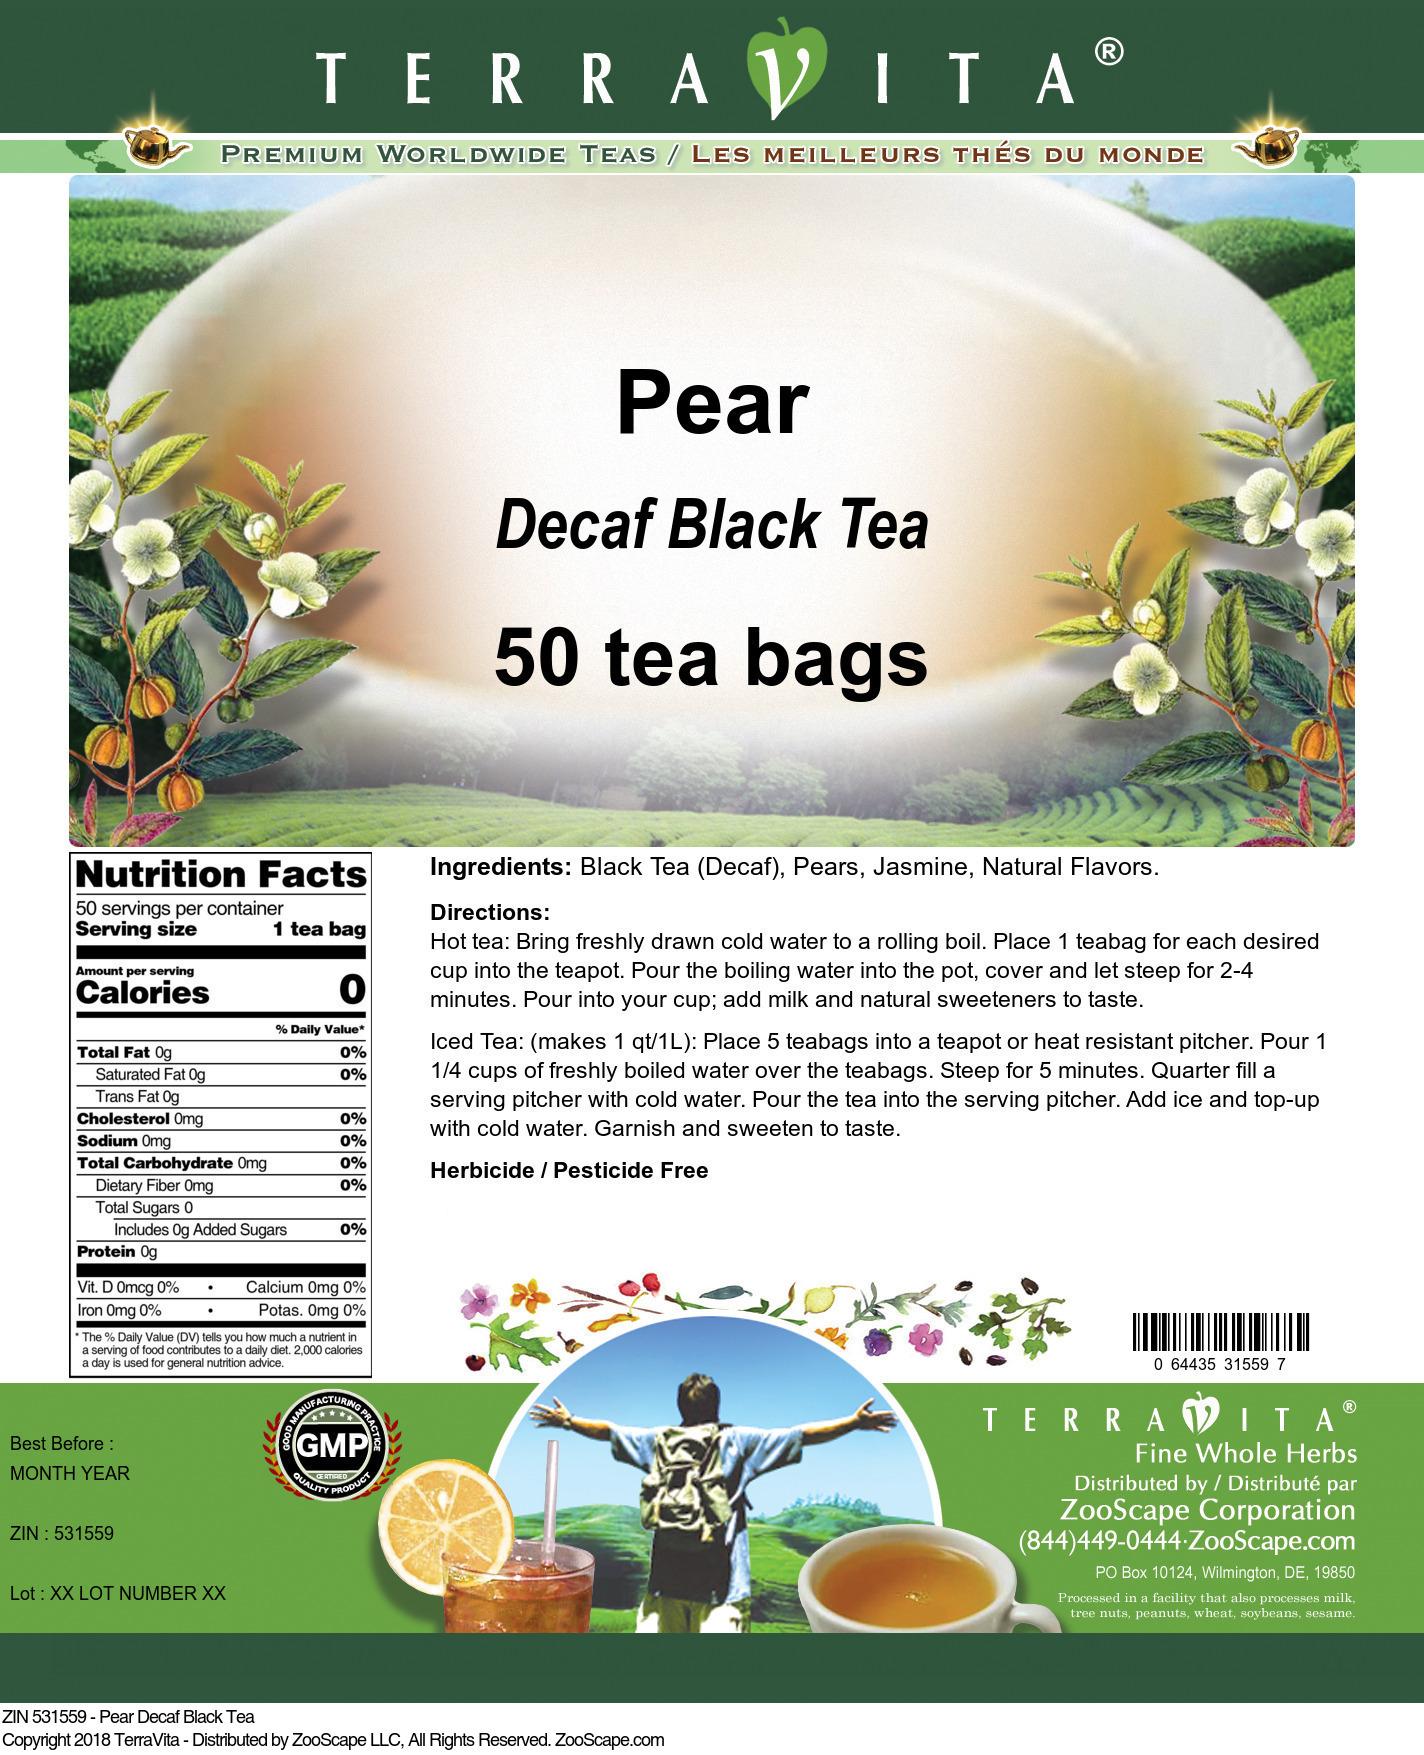 Pear Decaf Black Tea